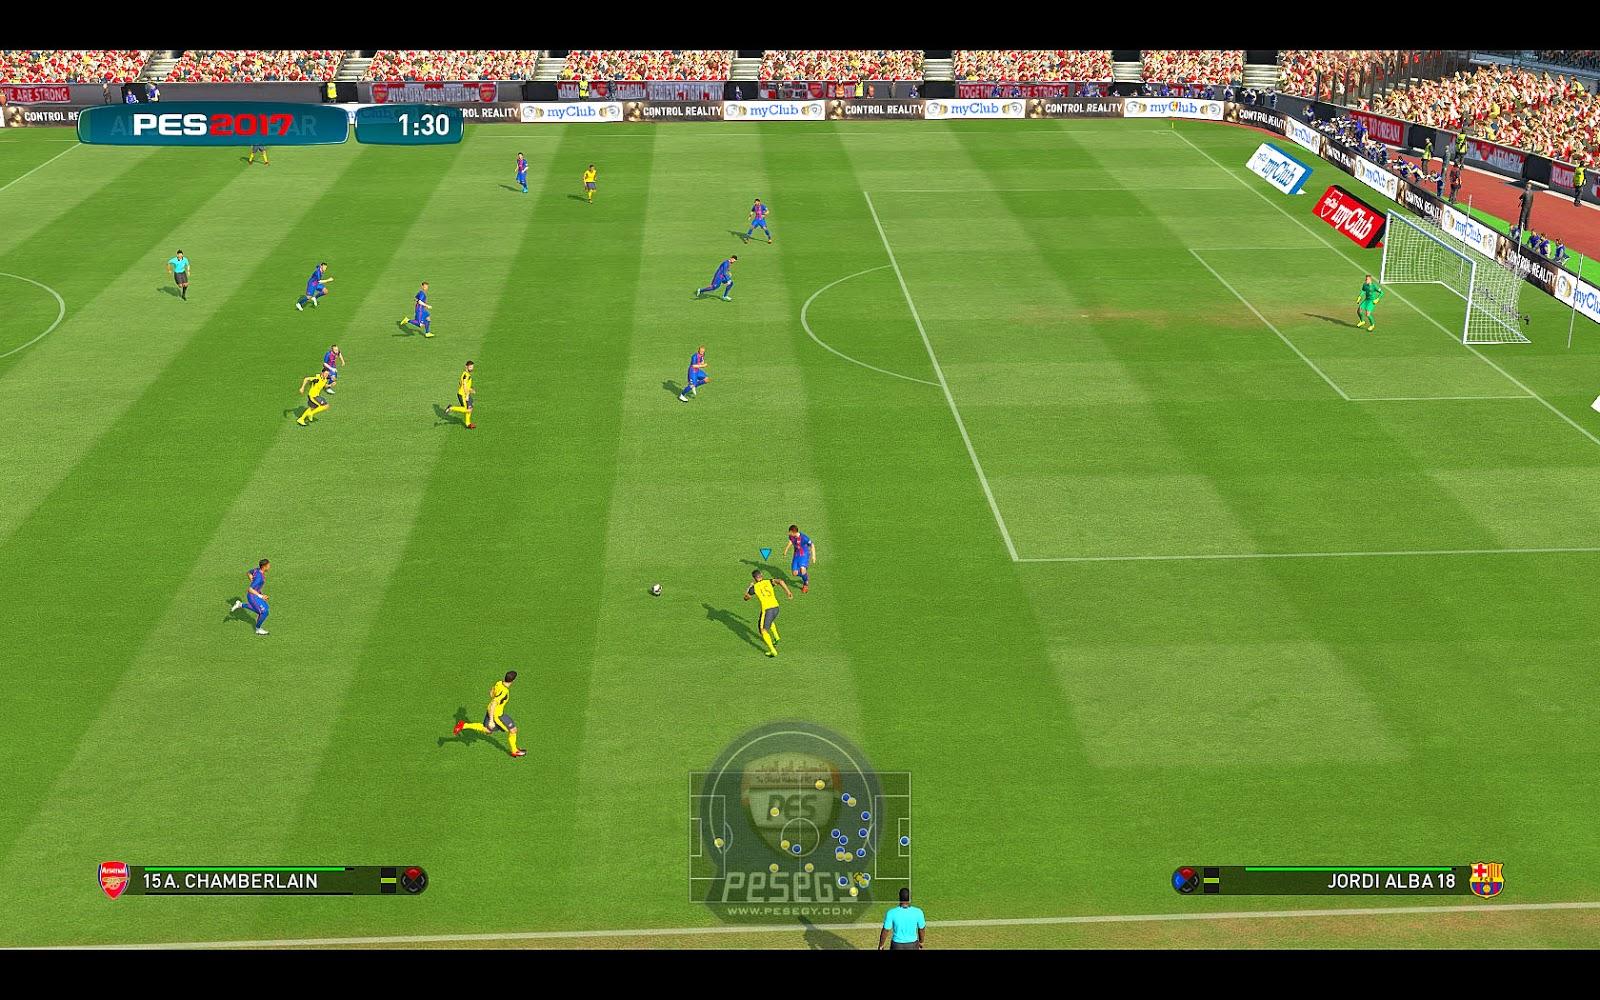 Copy example: c:\\program files (x86)\\steam\\steamapps\\common\\pro evolution soccer 2017